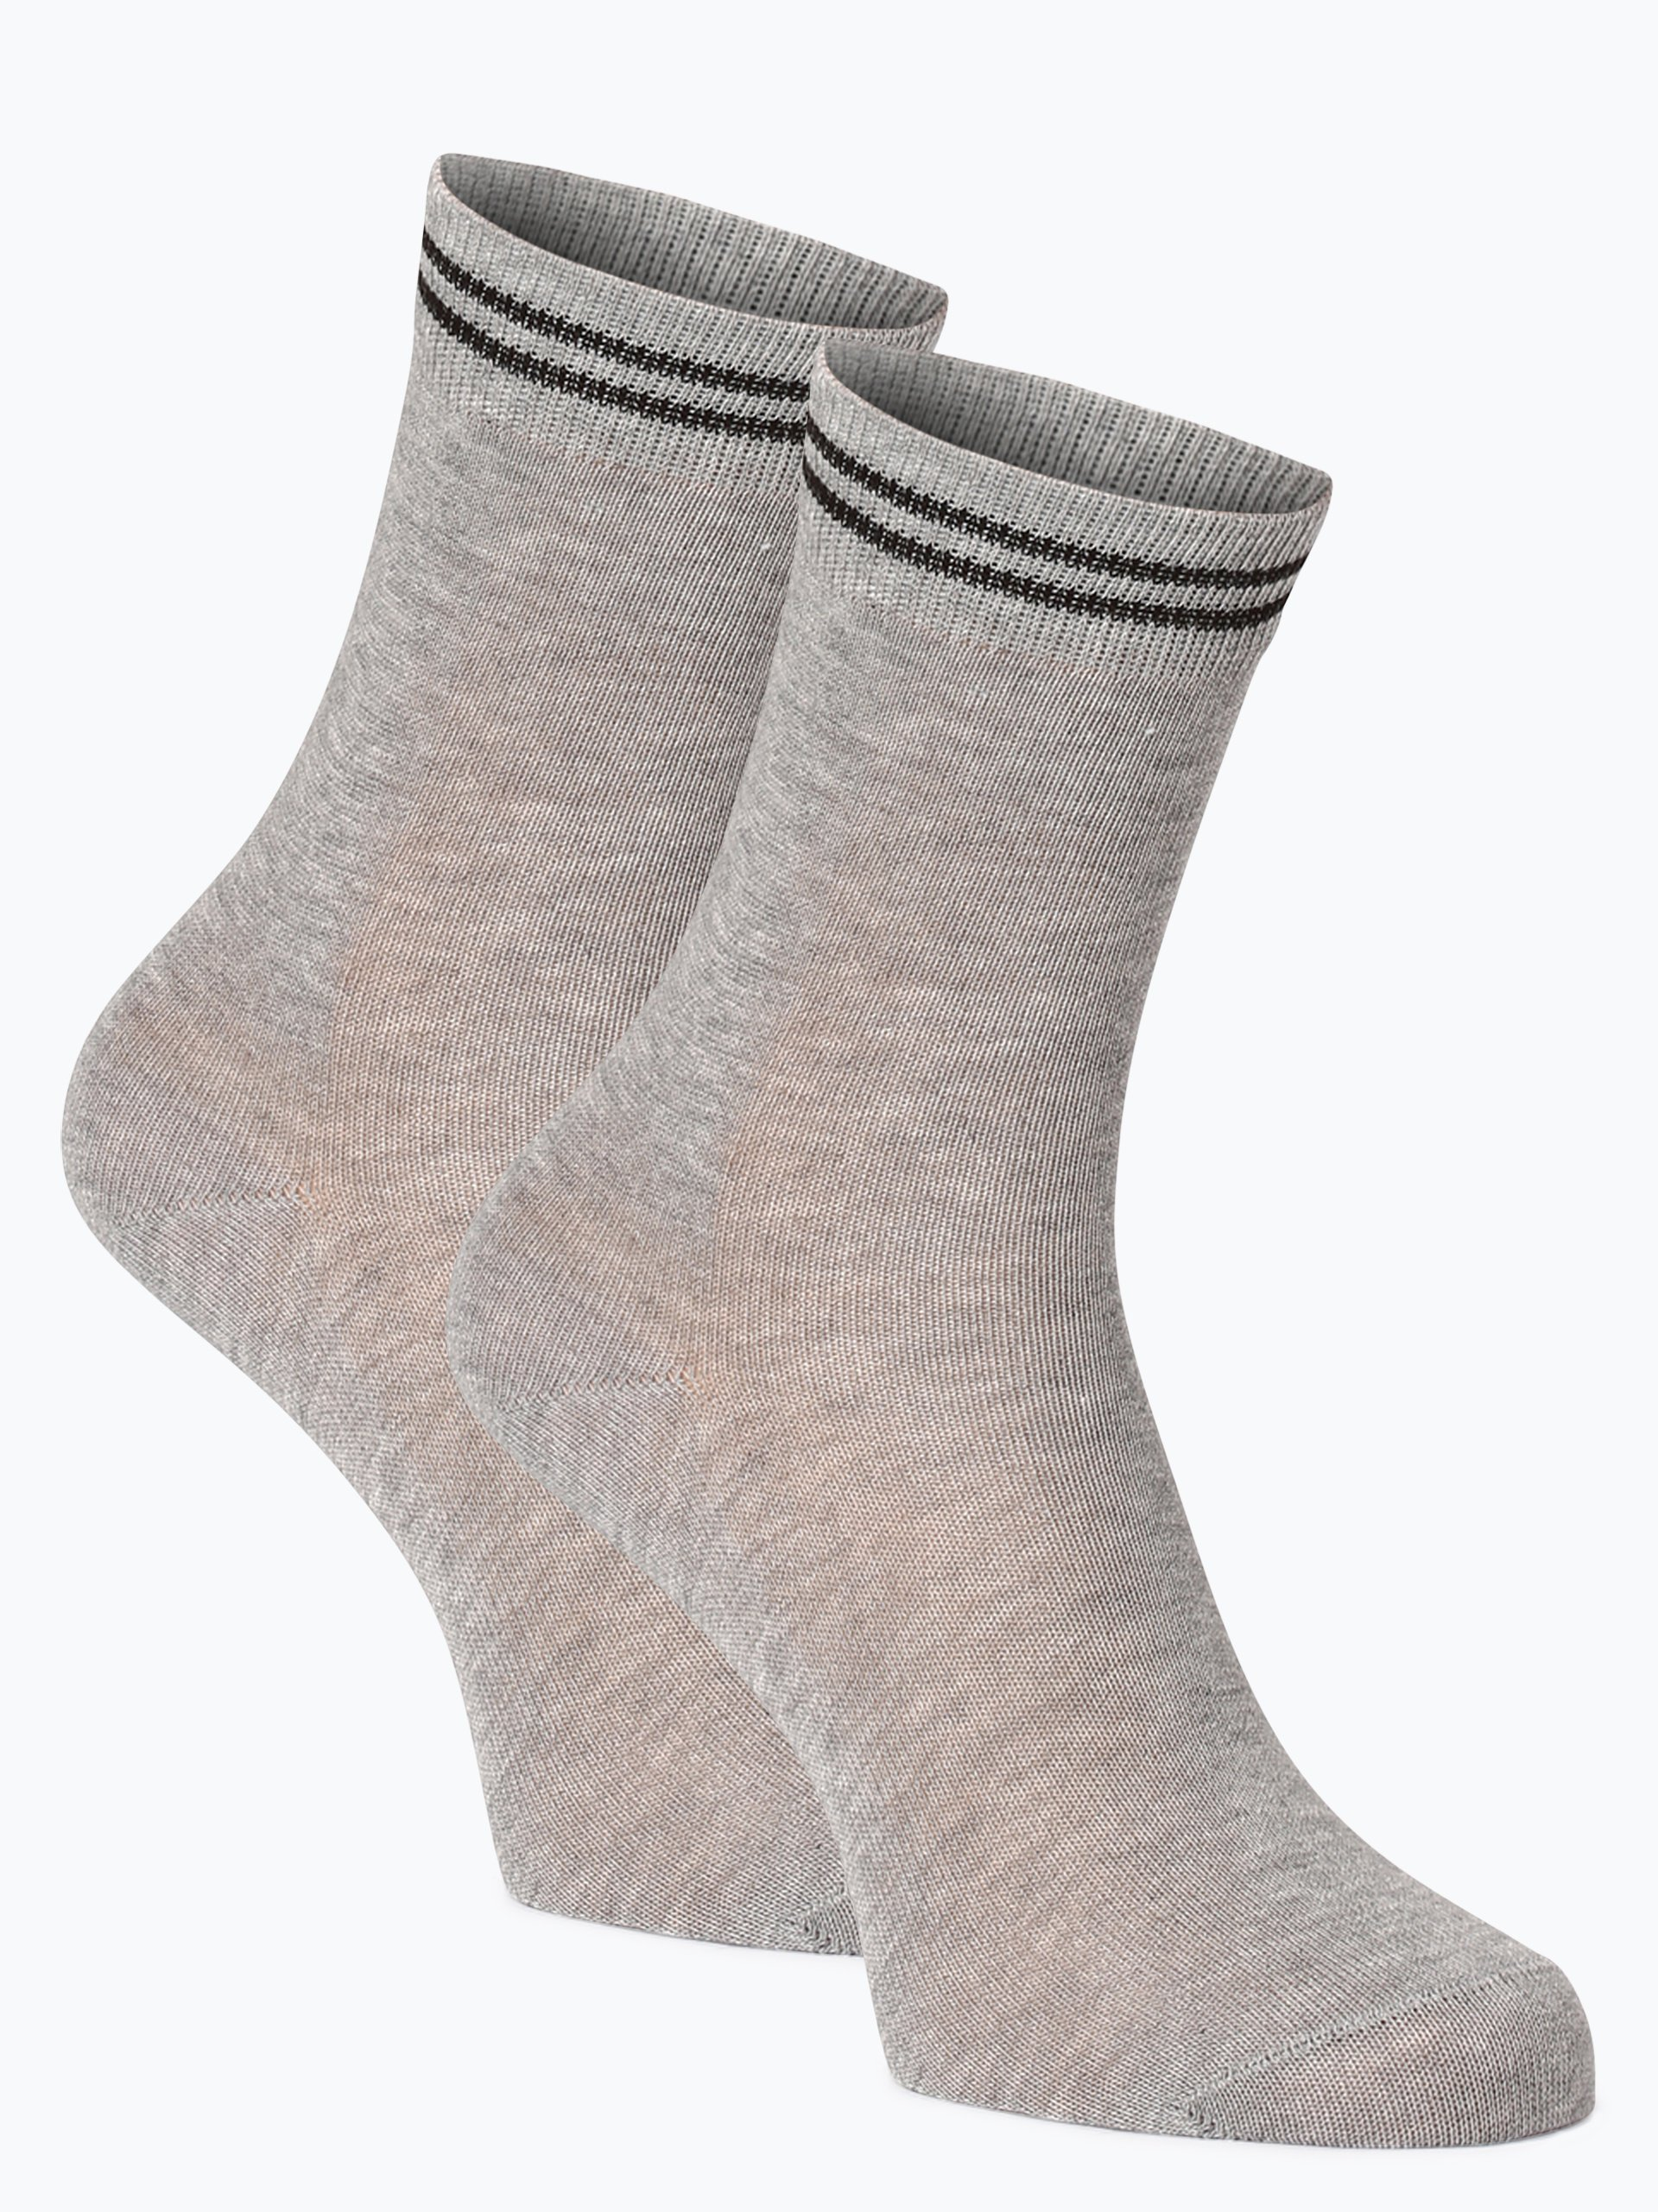 FALKE Kinder Socken im 2er-Pack